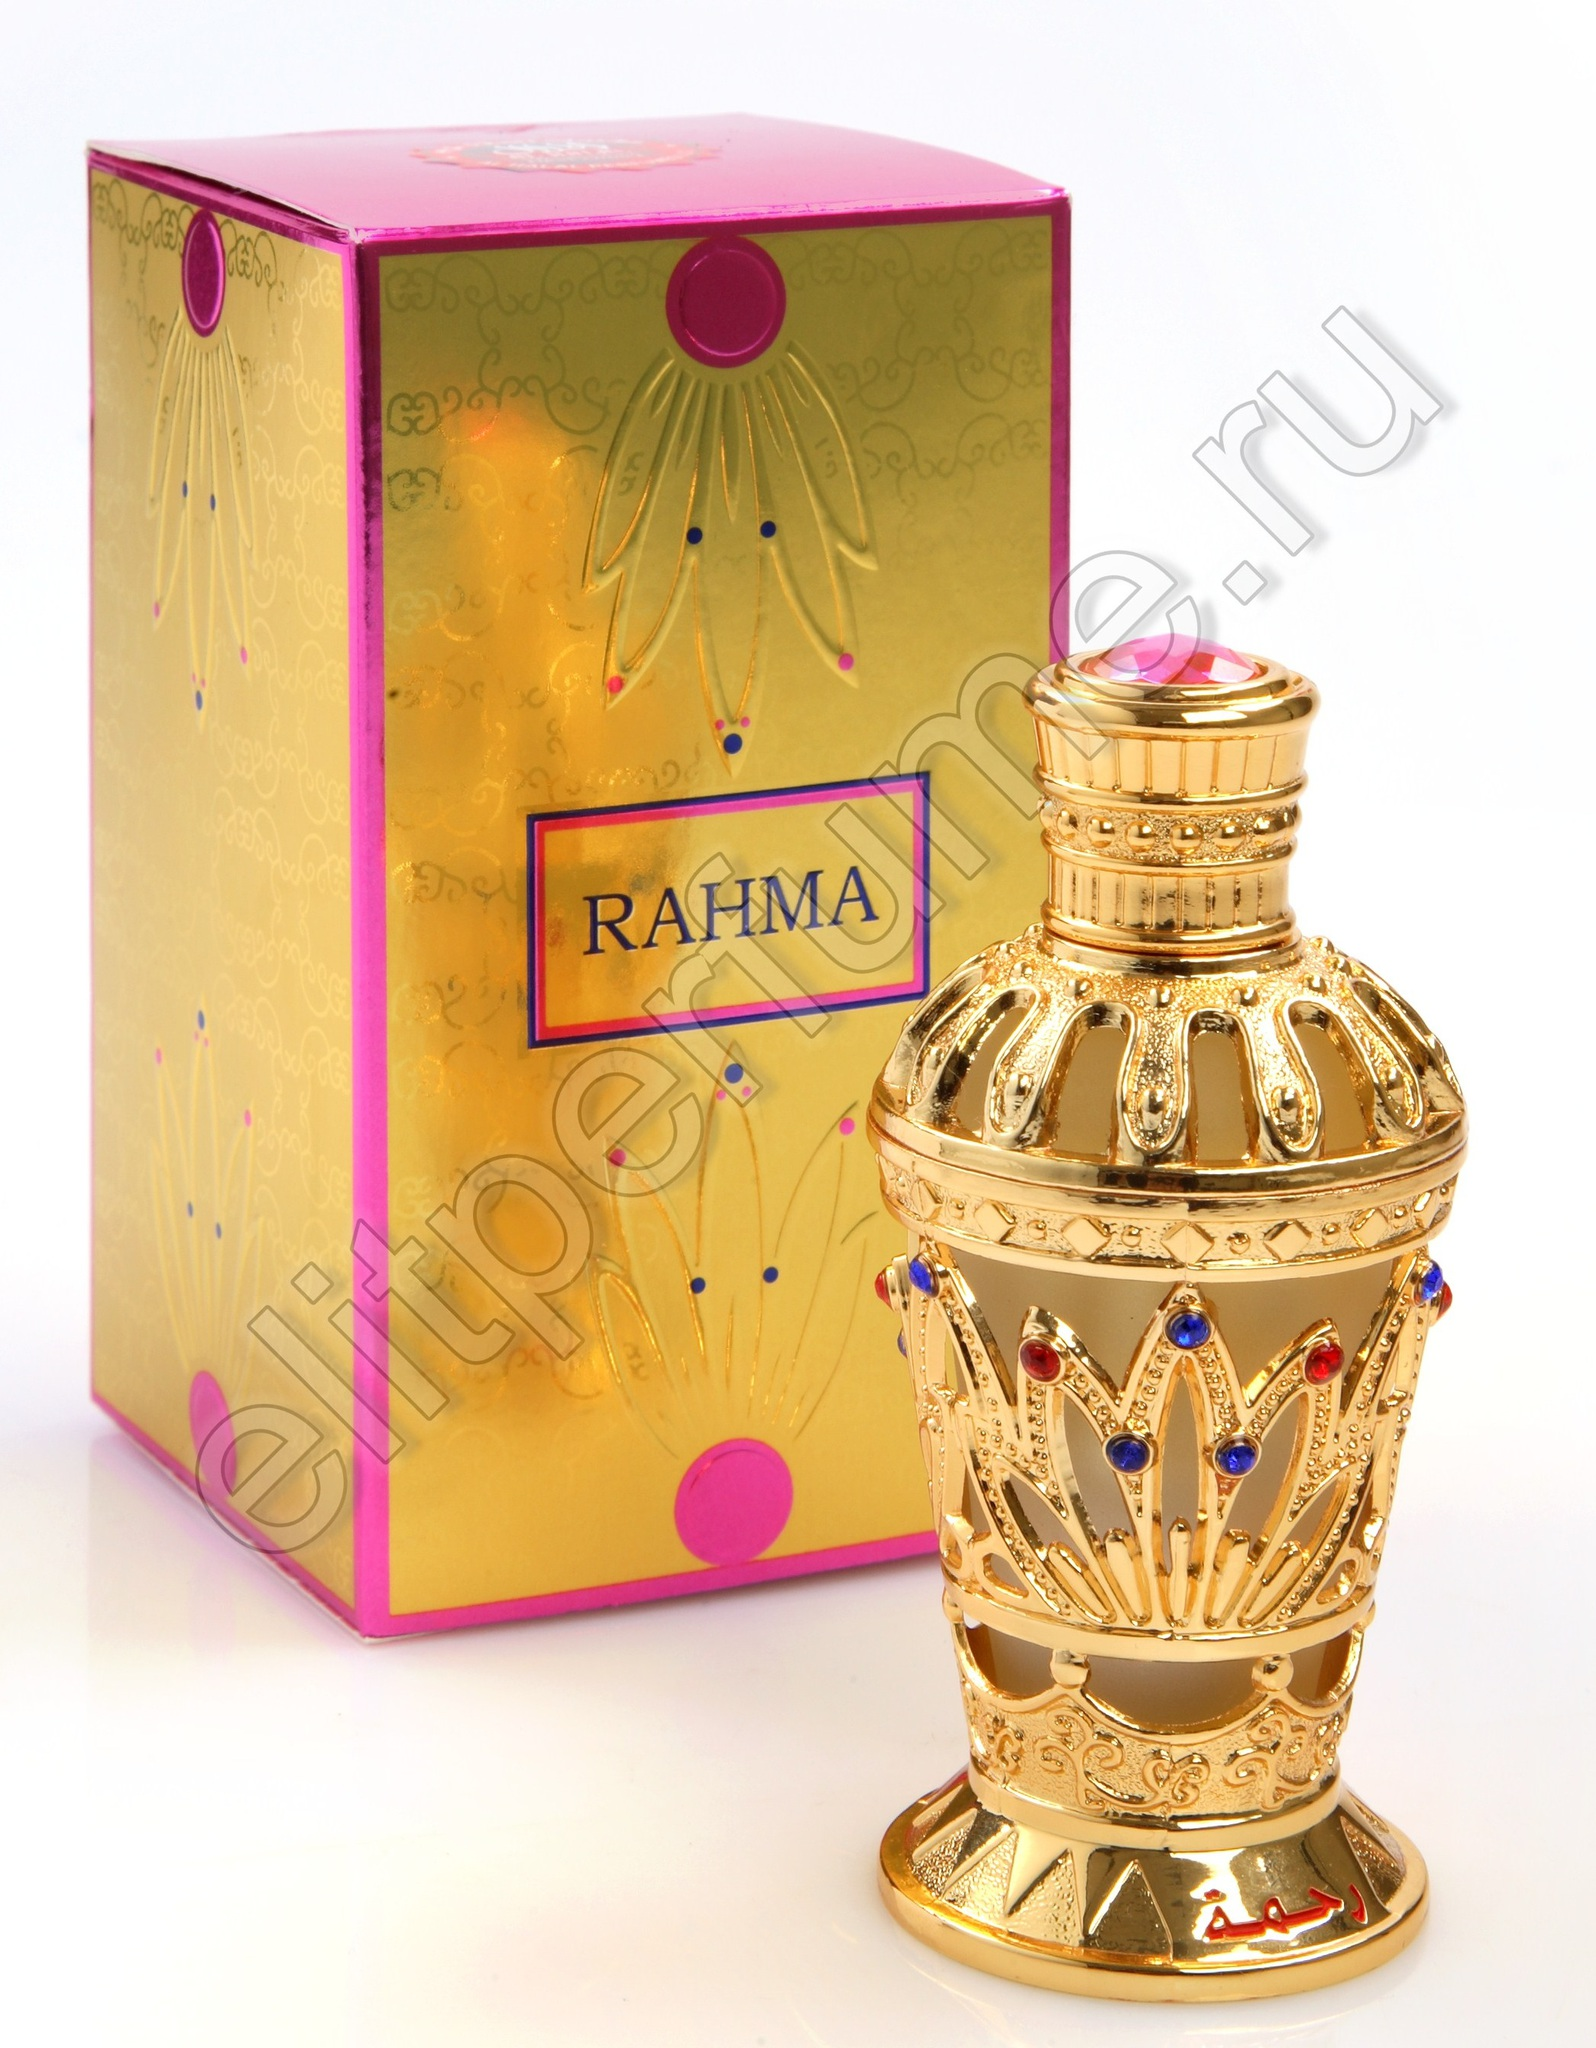 Рама Rahma 20 мл арабские масляные духи от Аль Харамайн Al Haramain Perfumes